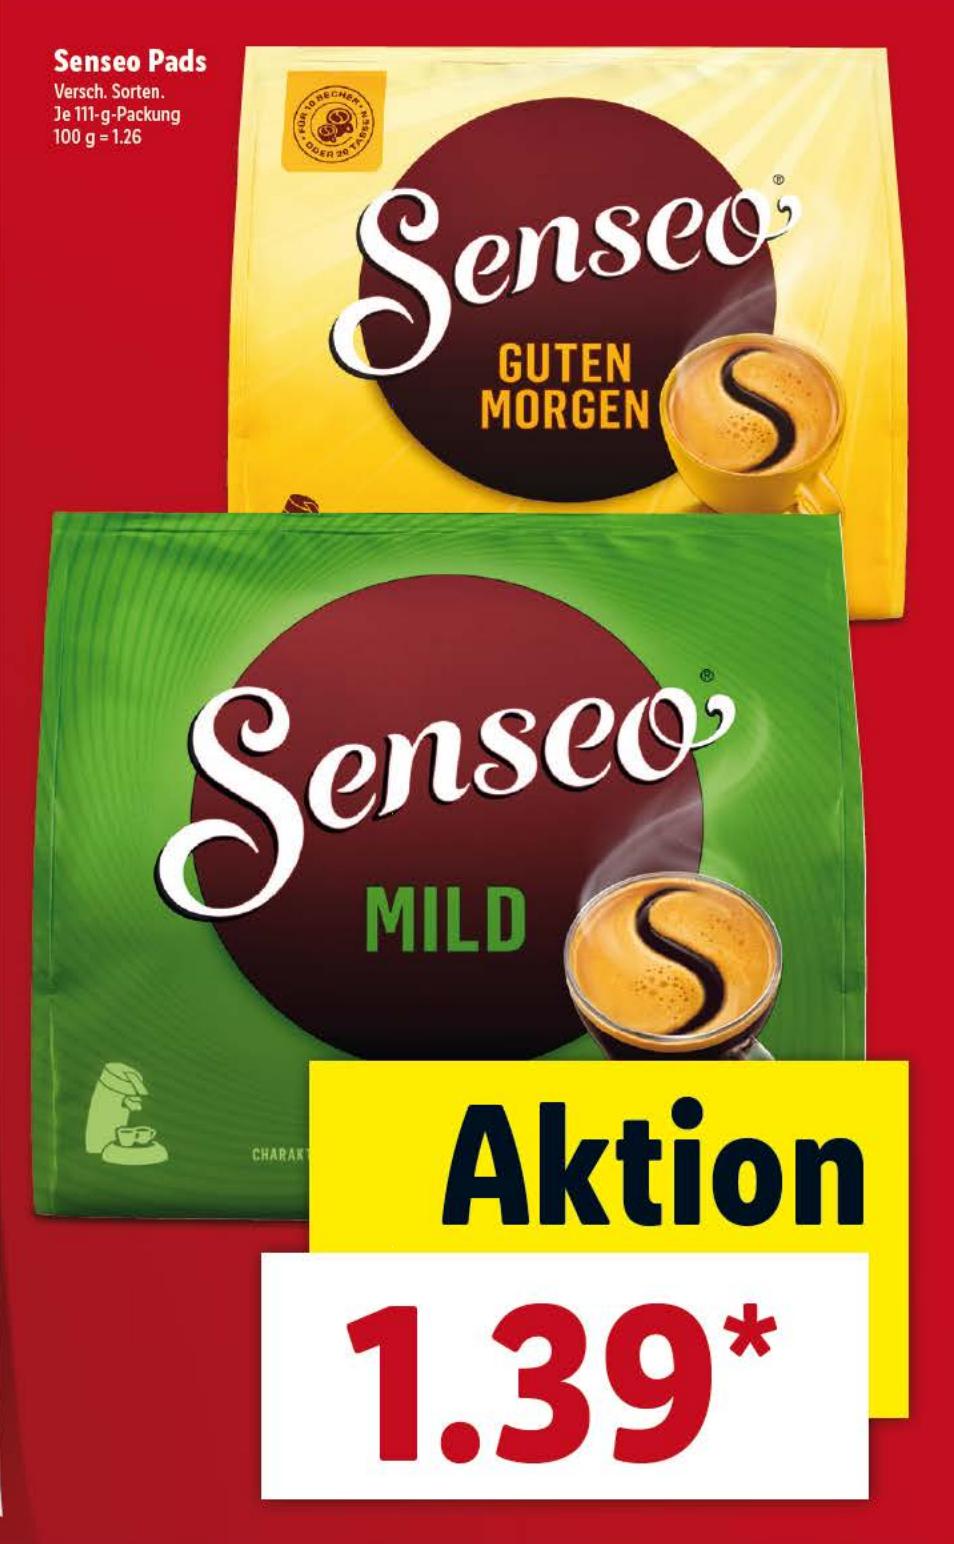 Senseo (Mild) Koffiepads @ Lidl.de [Grensdeal]